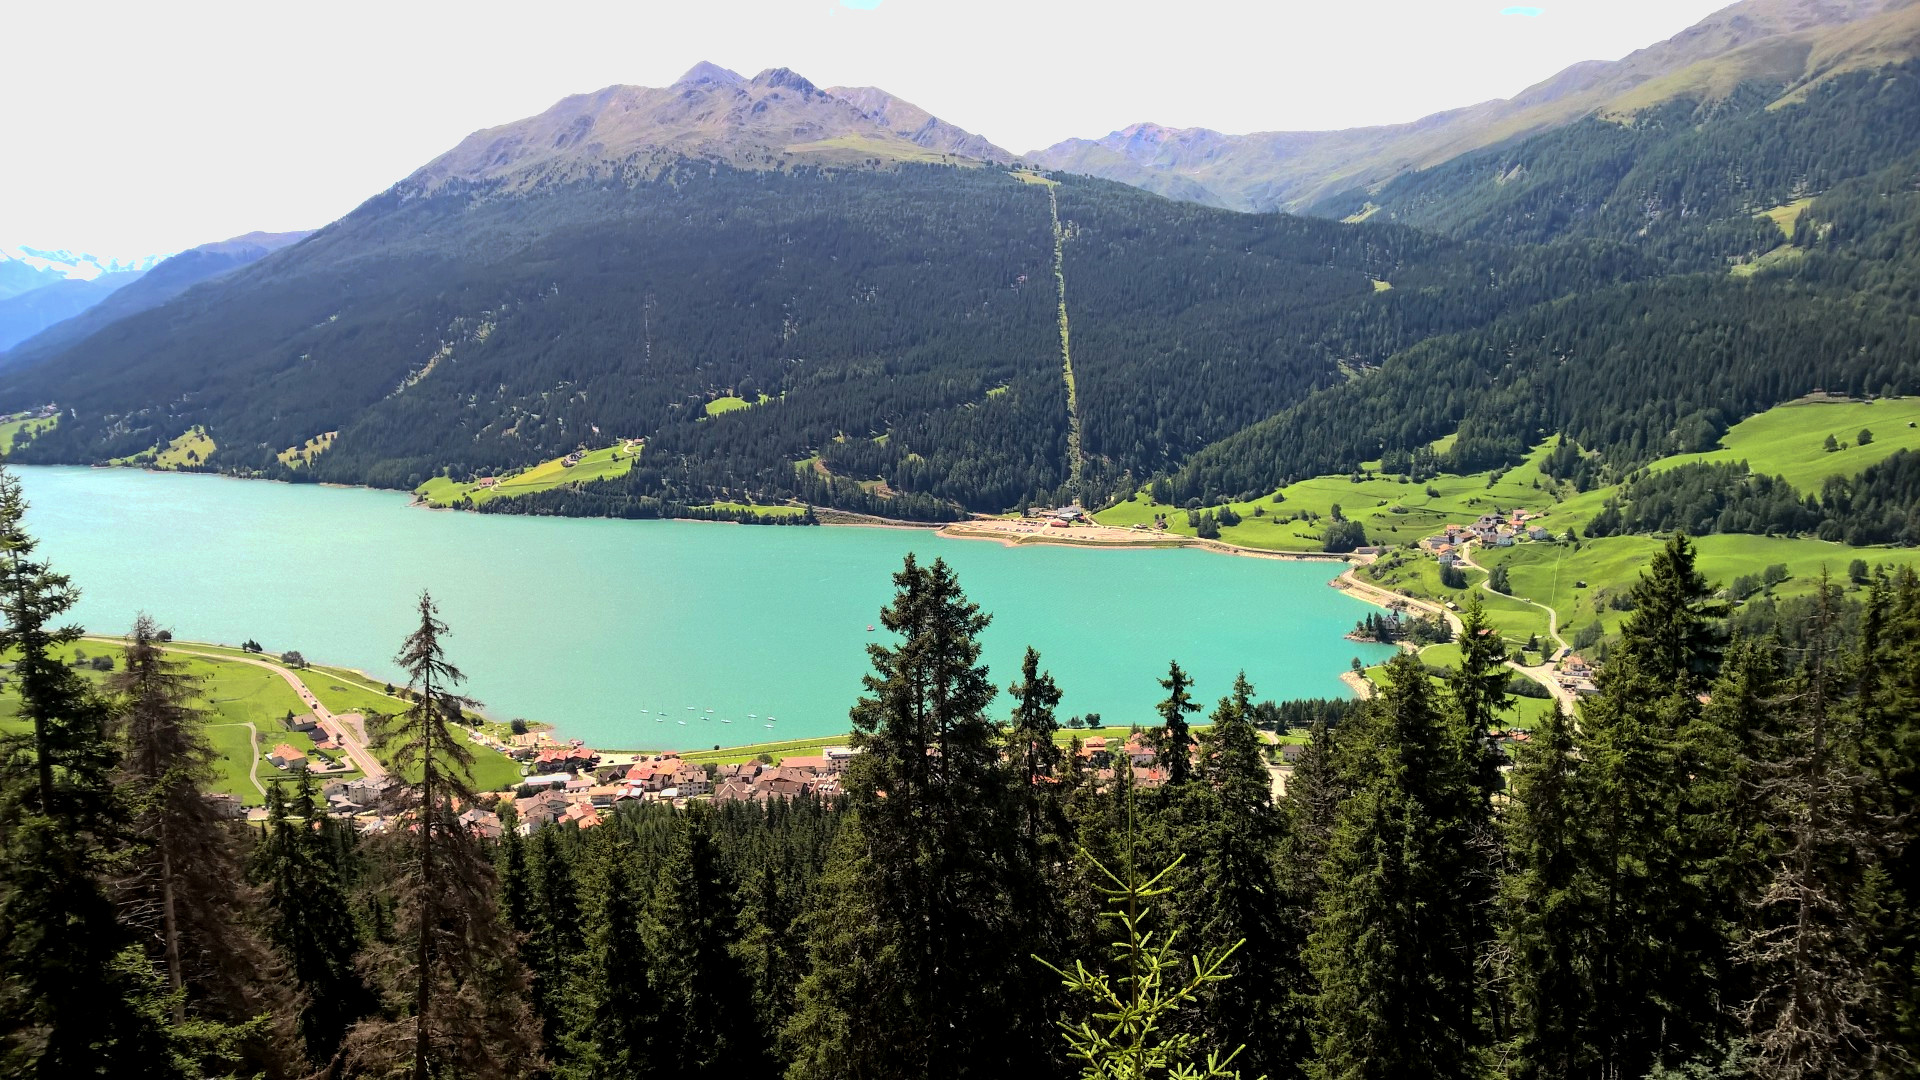 Nauders, 3 Länder Enduro Trails, Mountainbiken, Reschenpass, Basecamp, Tirol, Freeride